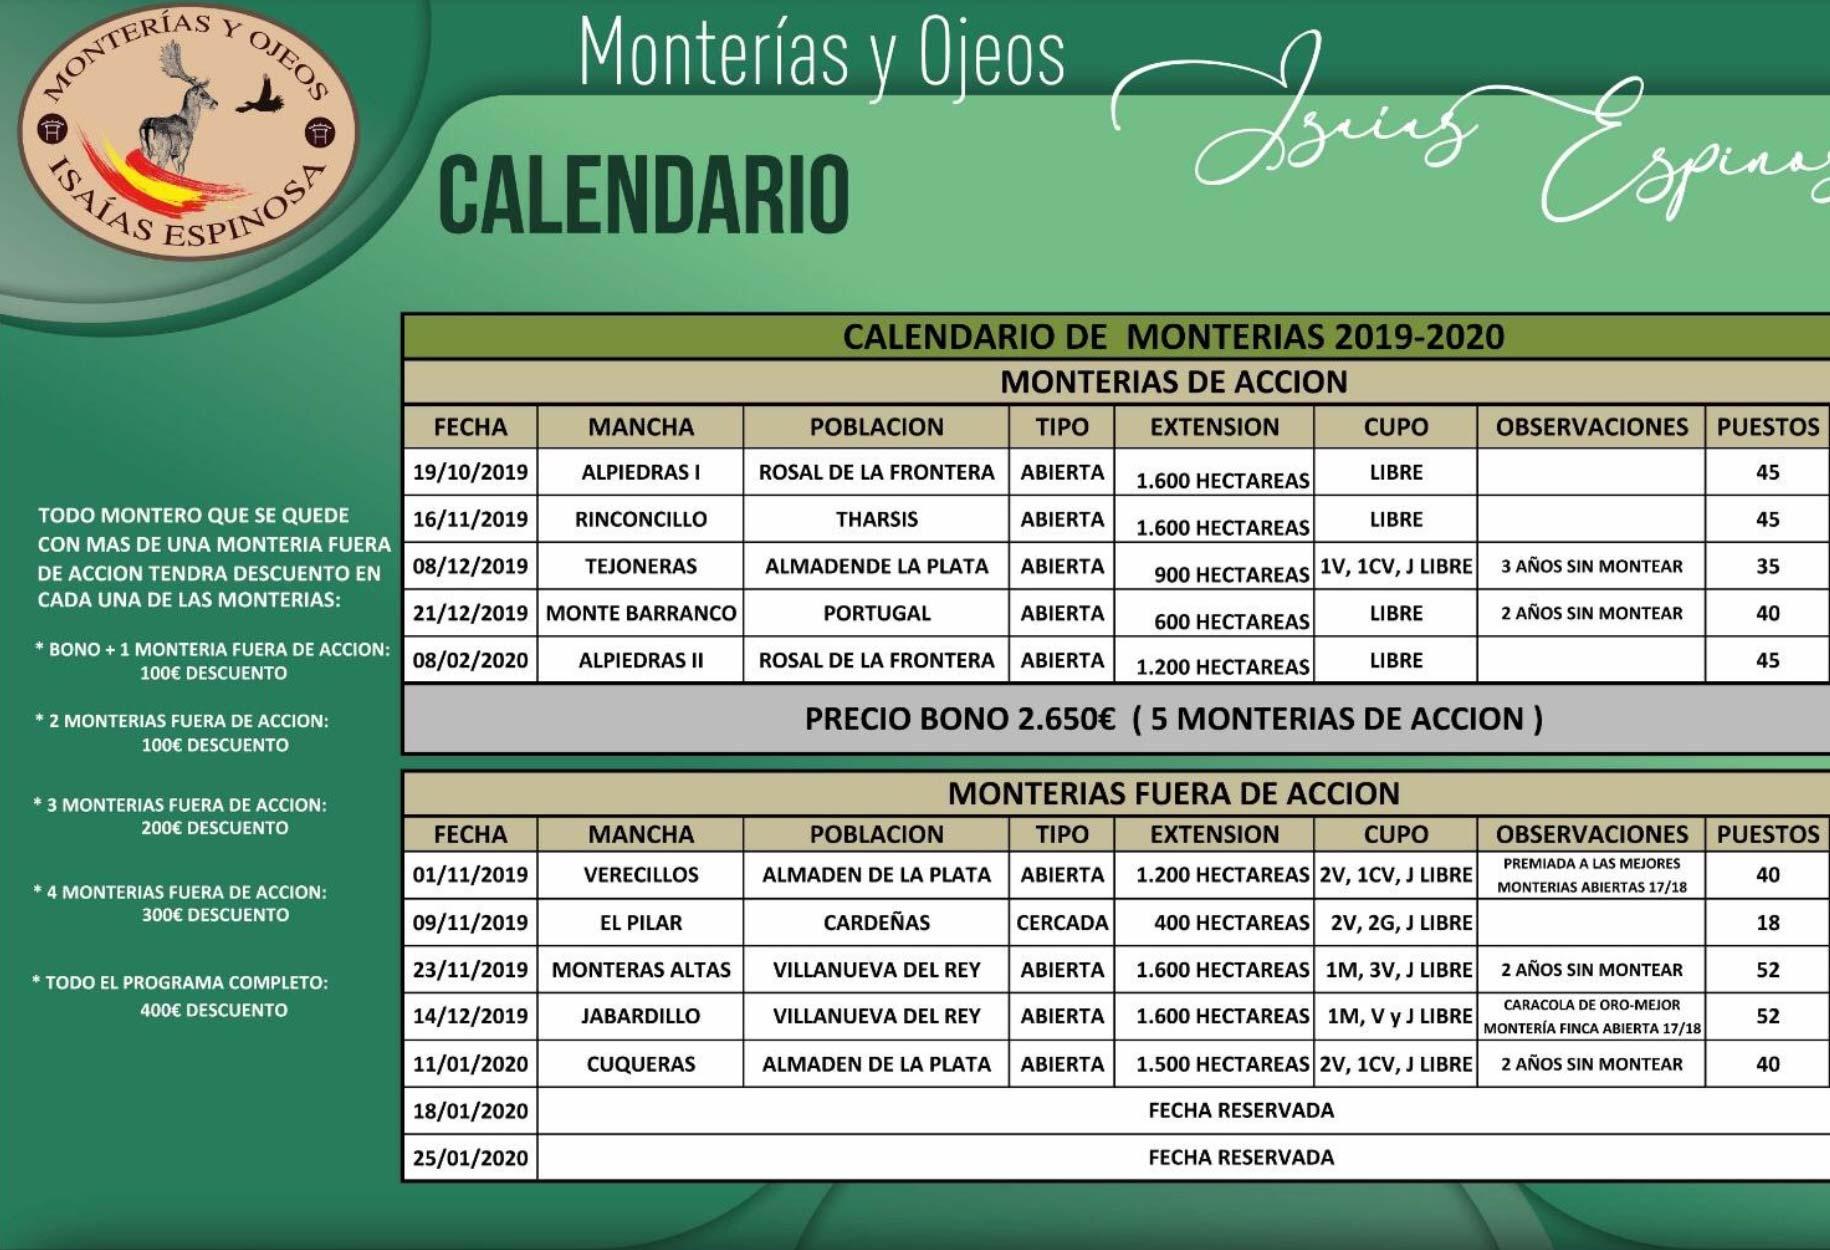 Programa Monterias Isaías Espinosa